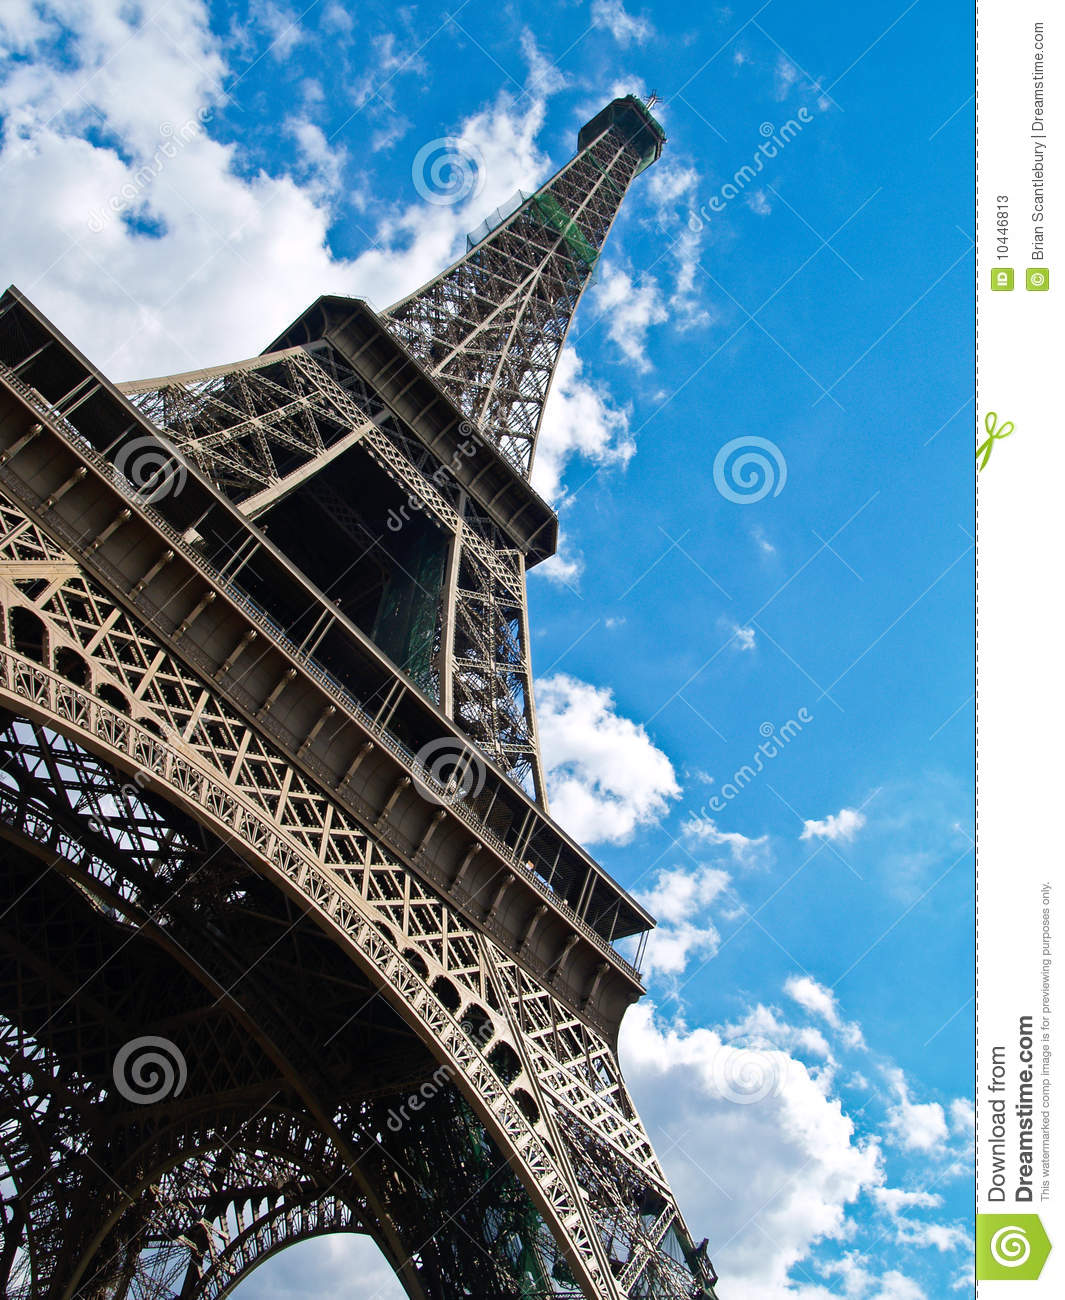 Eiffel Tower, Low Angle Shot. Stock Photos.